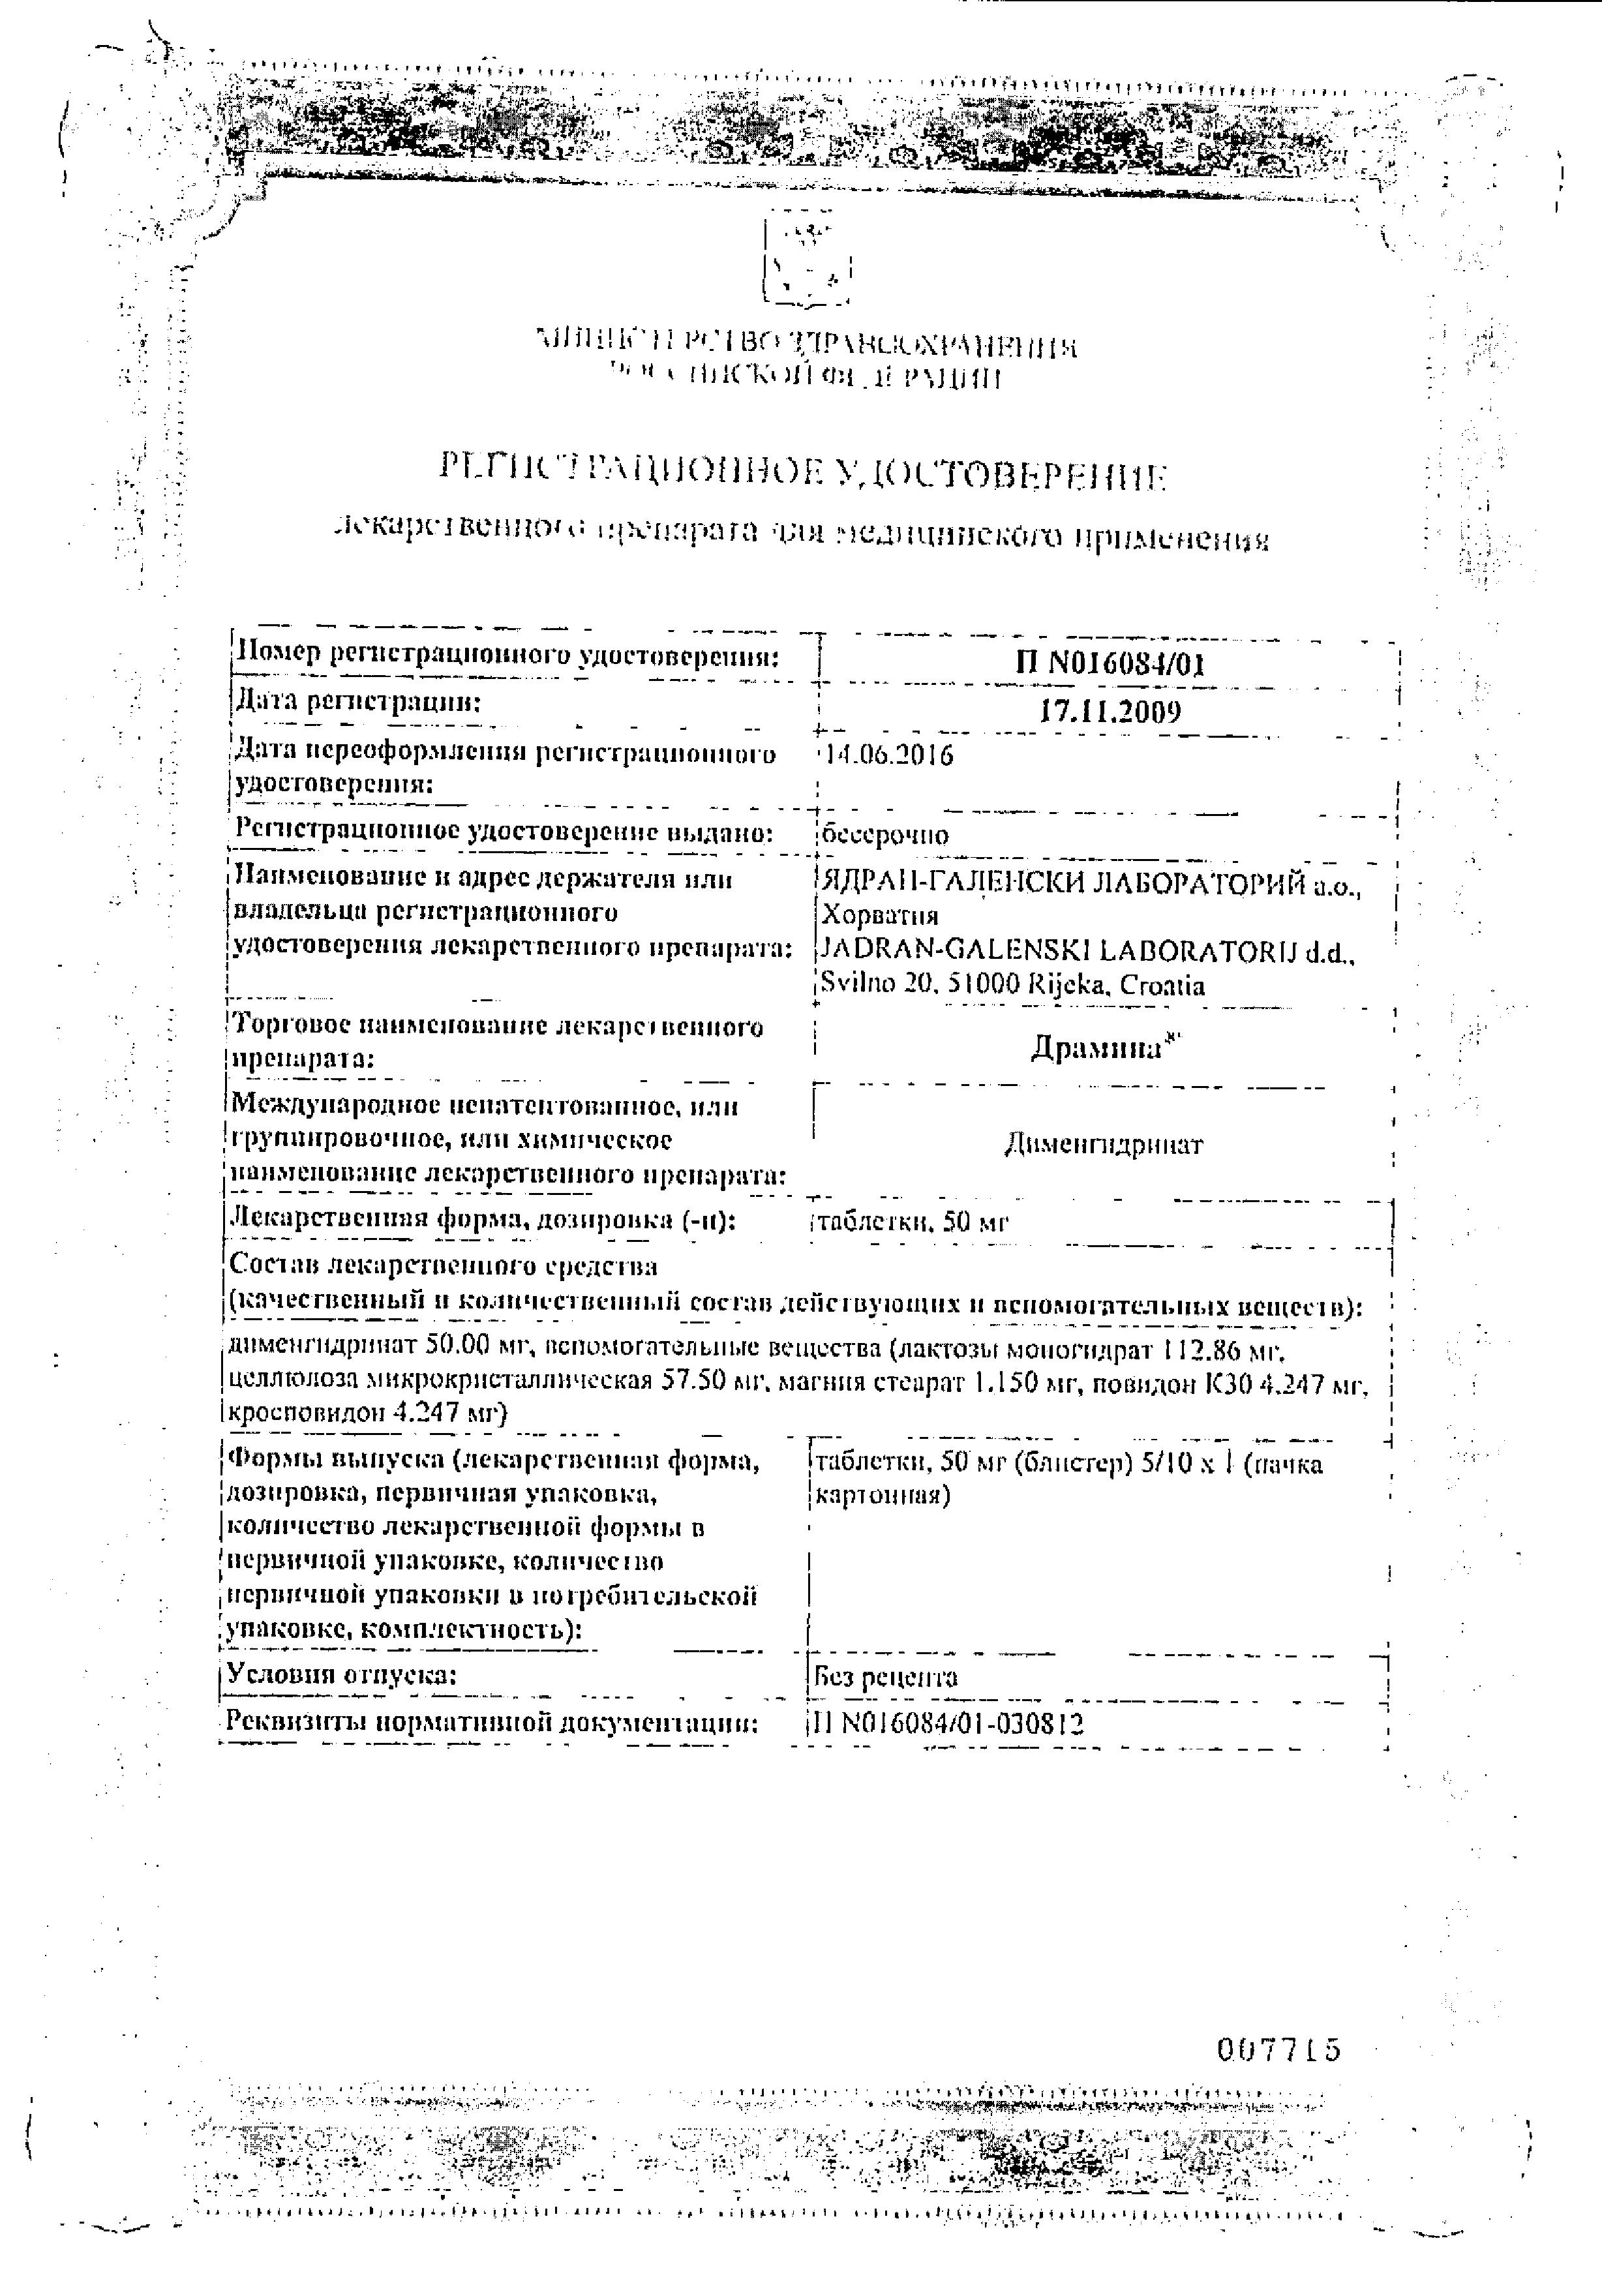 Драмина сертификат